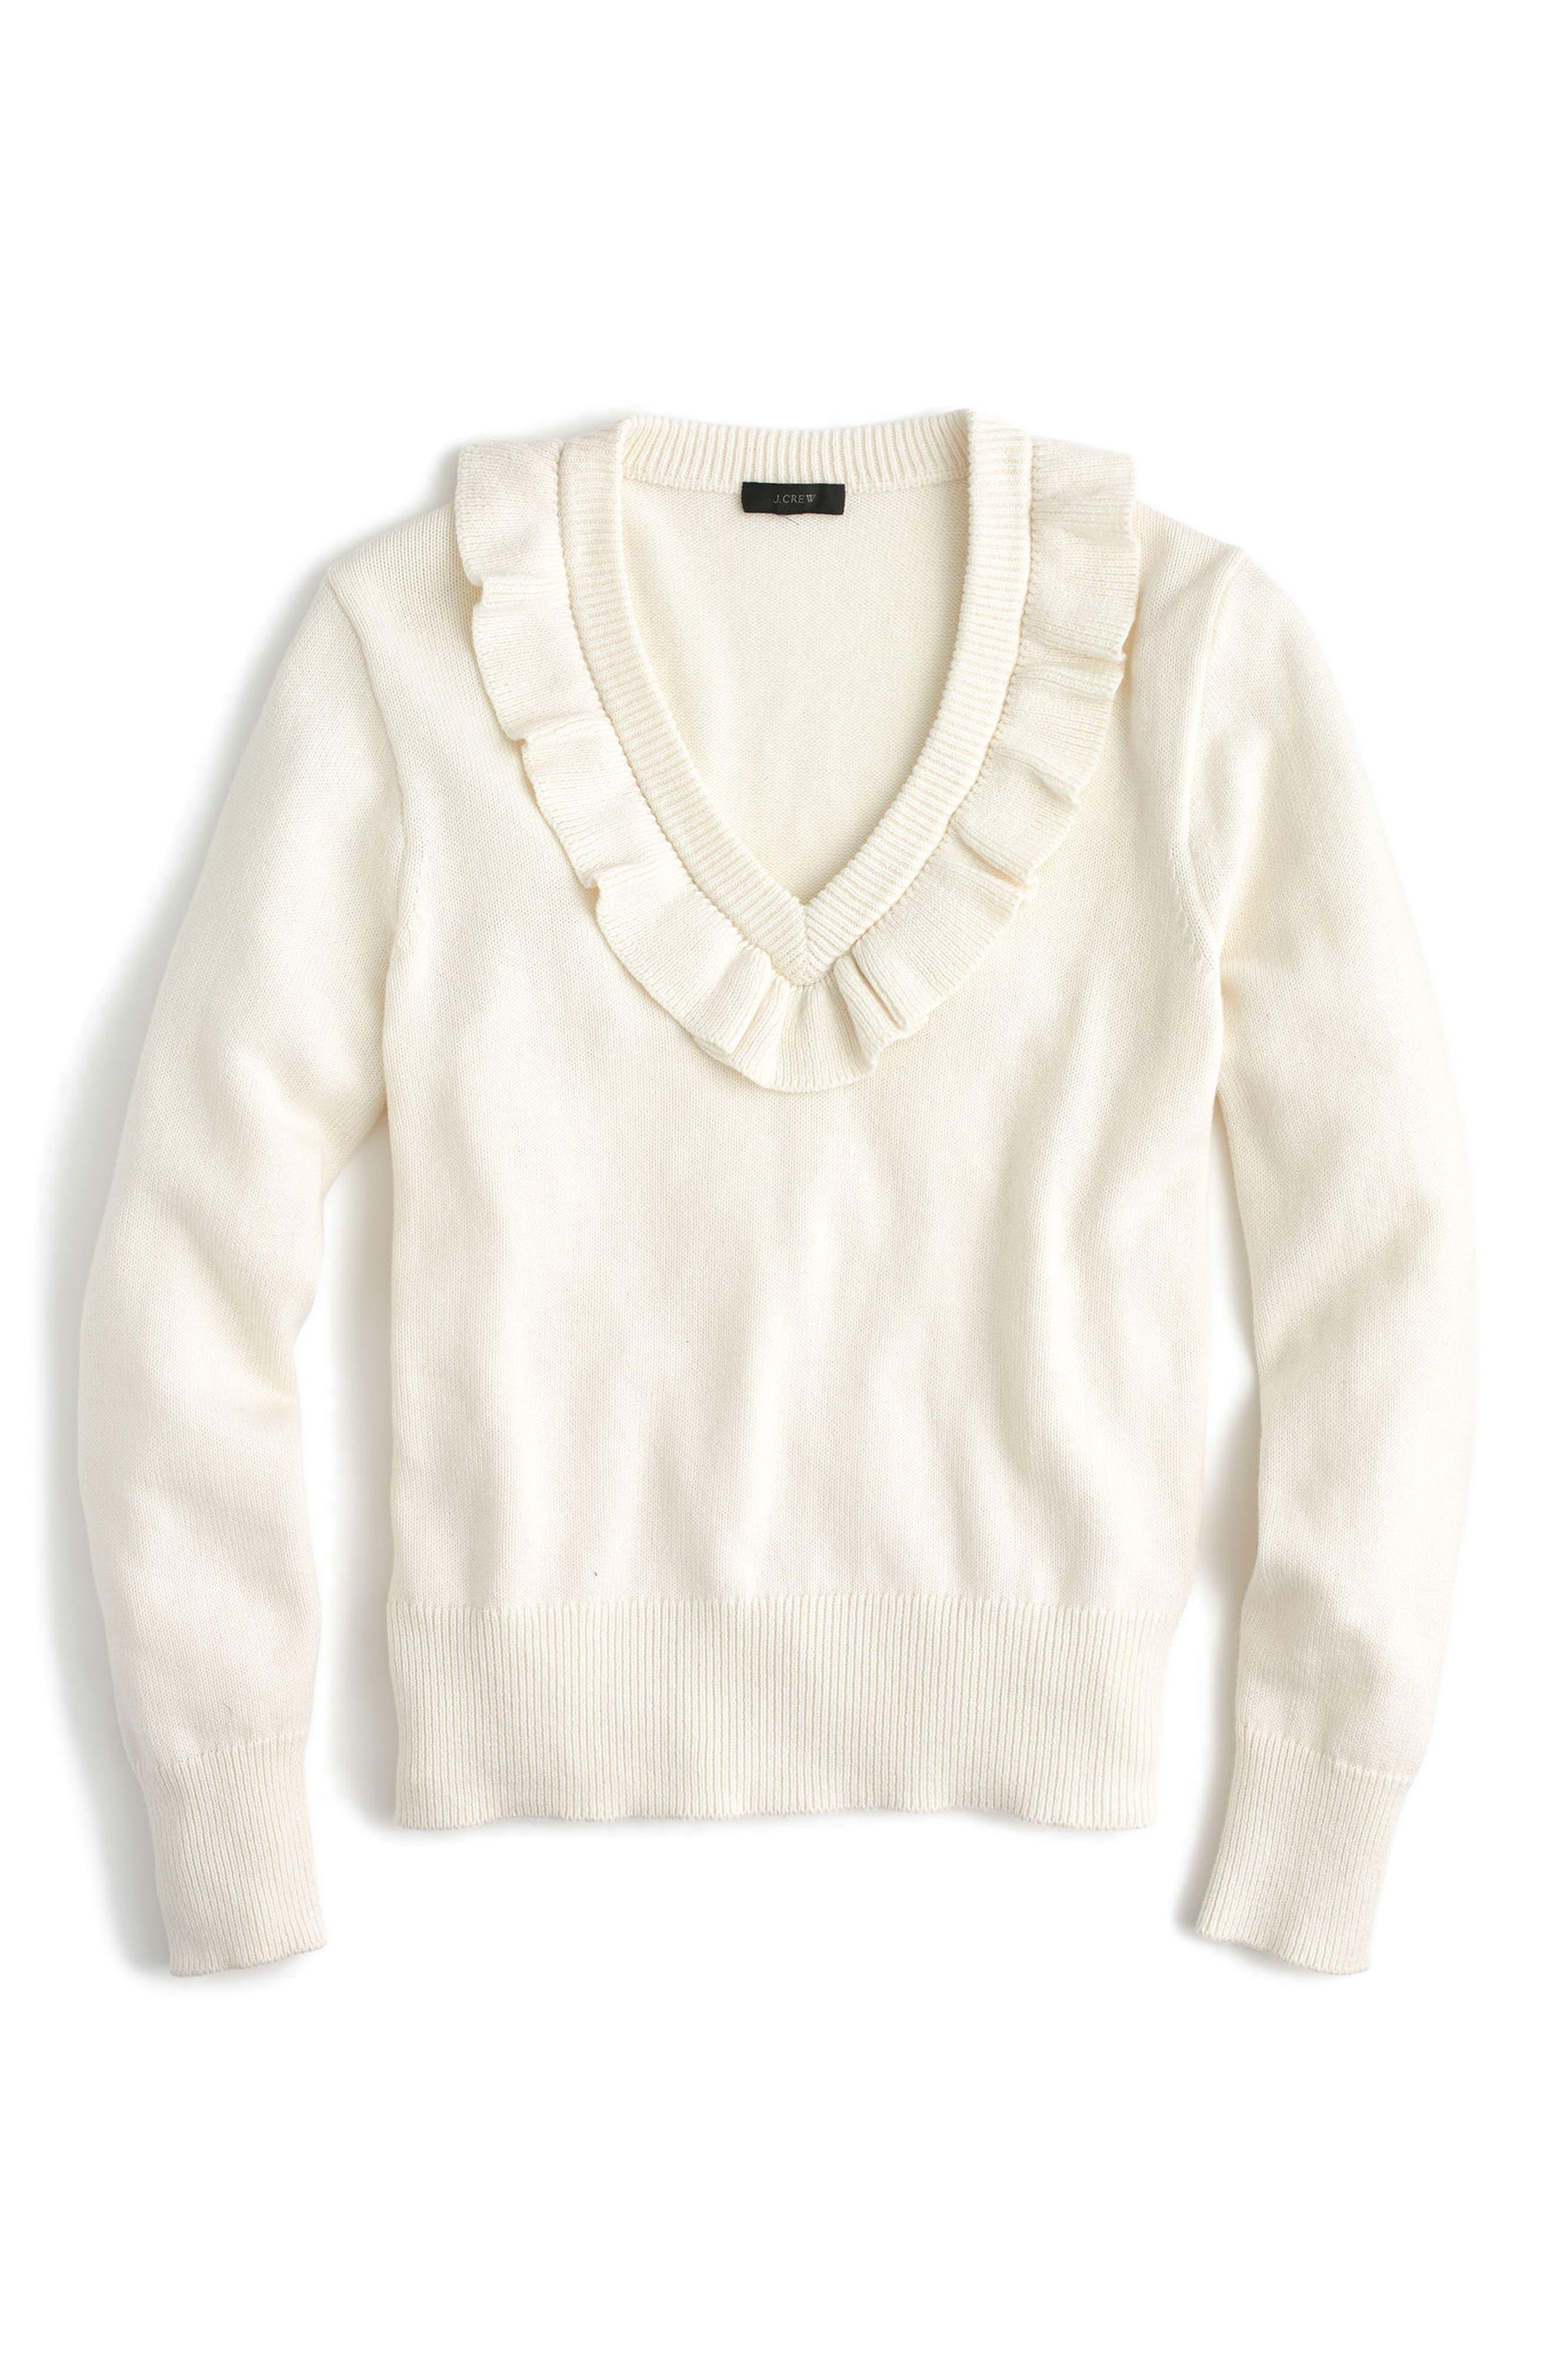 Ruffle V-Neck Sweater,                             Main thumbnail 1, color,                             090